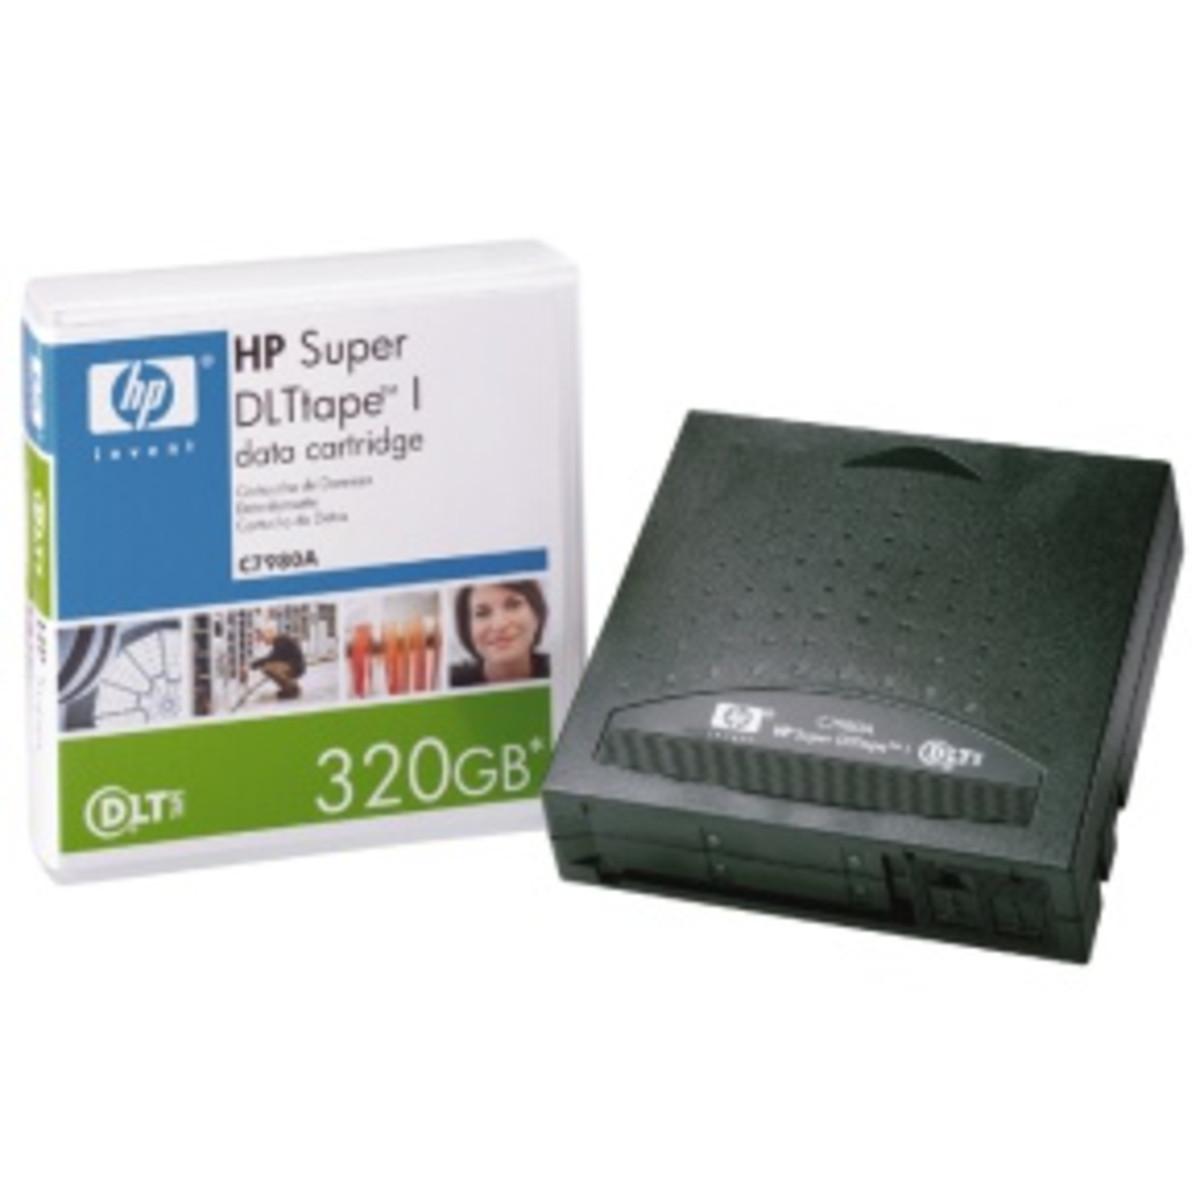 HP SDLT Tape 320GB Data CT (C7980A)